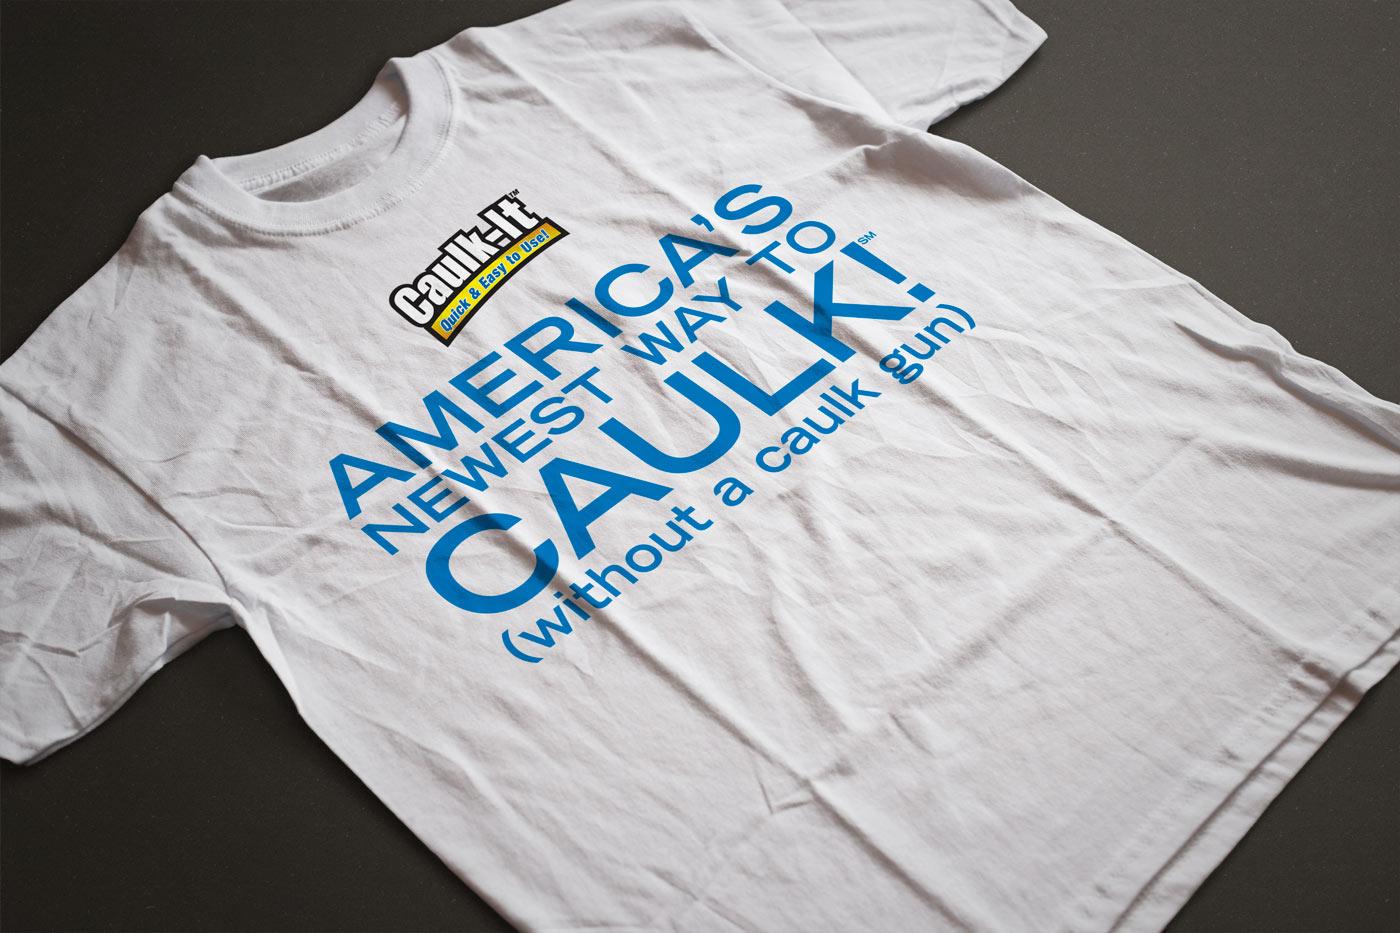 General Electric Caulk It T-Shirt Design